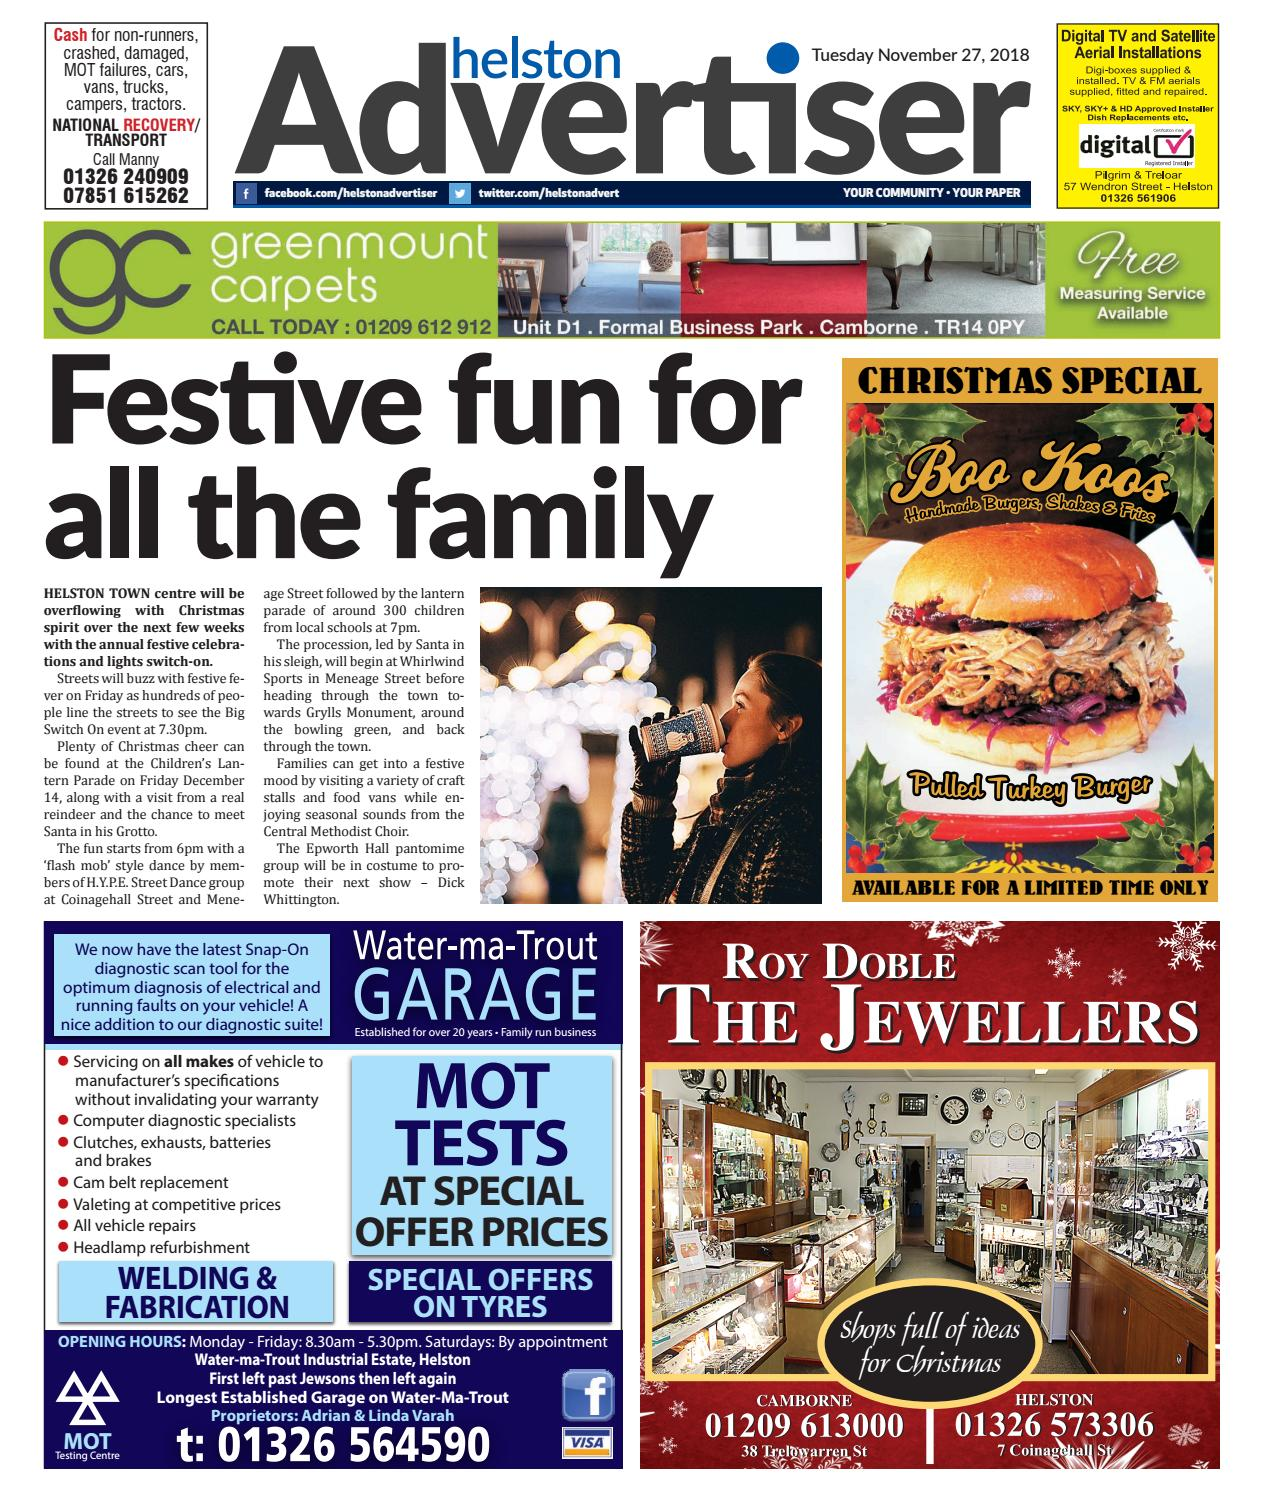 Helston Advertiser - November 27th 2018 by Helston Advertiser - issuu